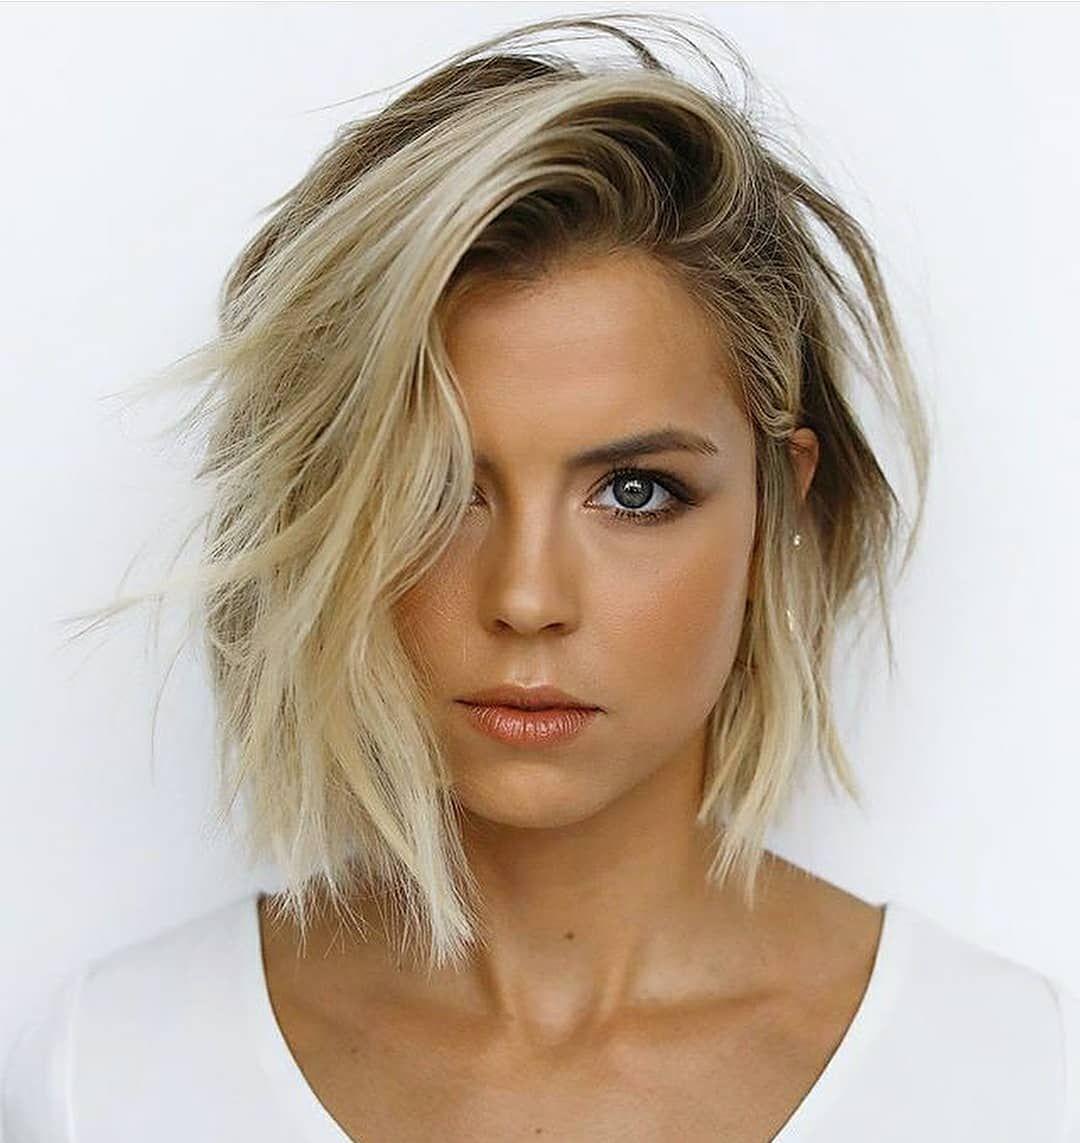 Zehn trendige kurze Bob Haarschnitte für Frauen - Frisuren Modelle #haircuts